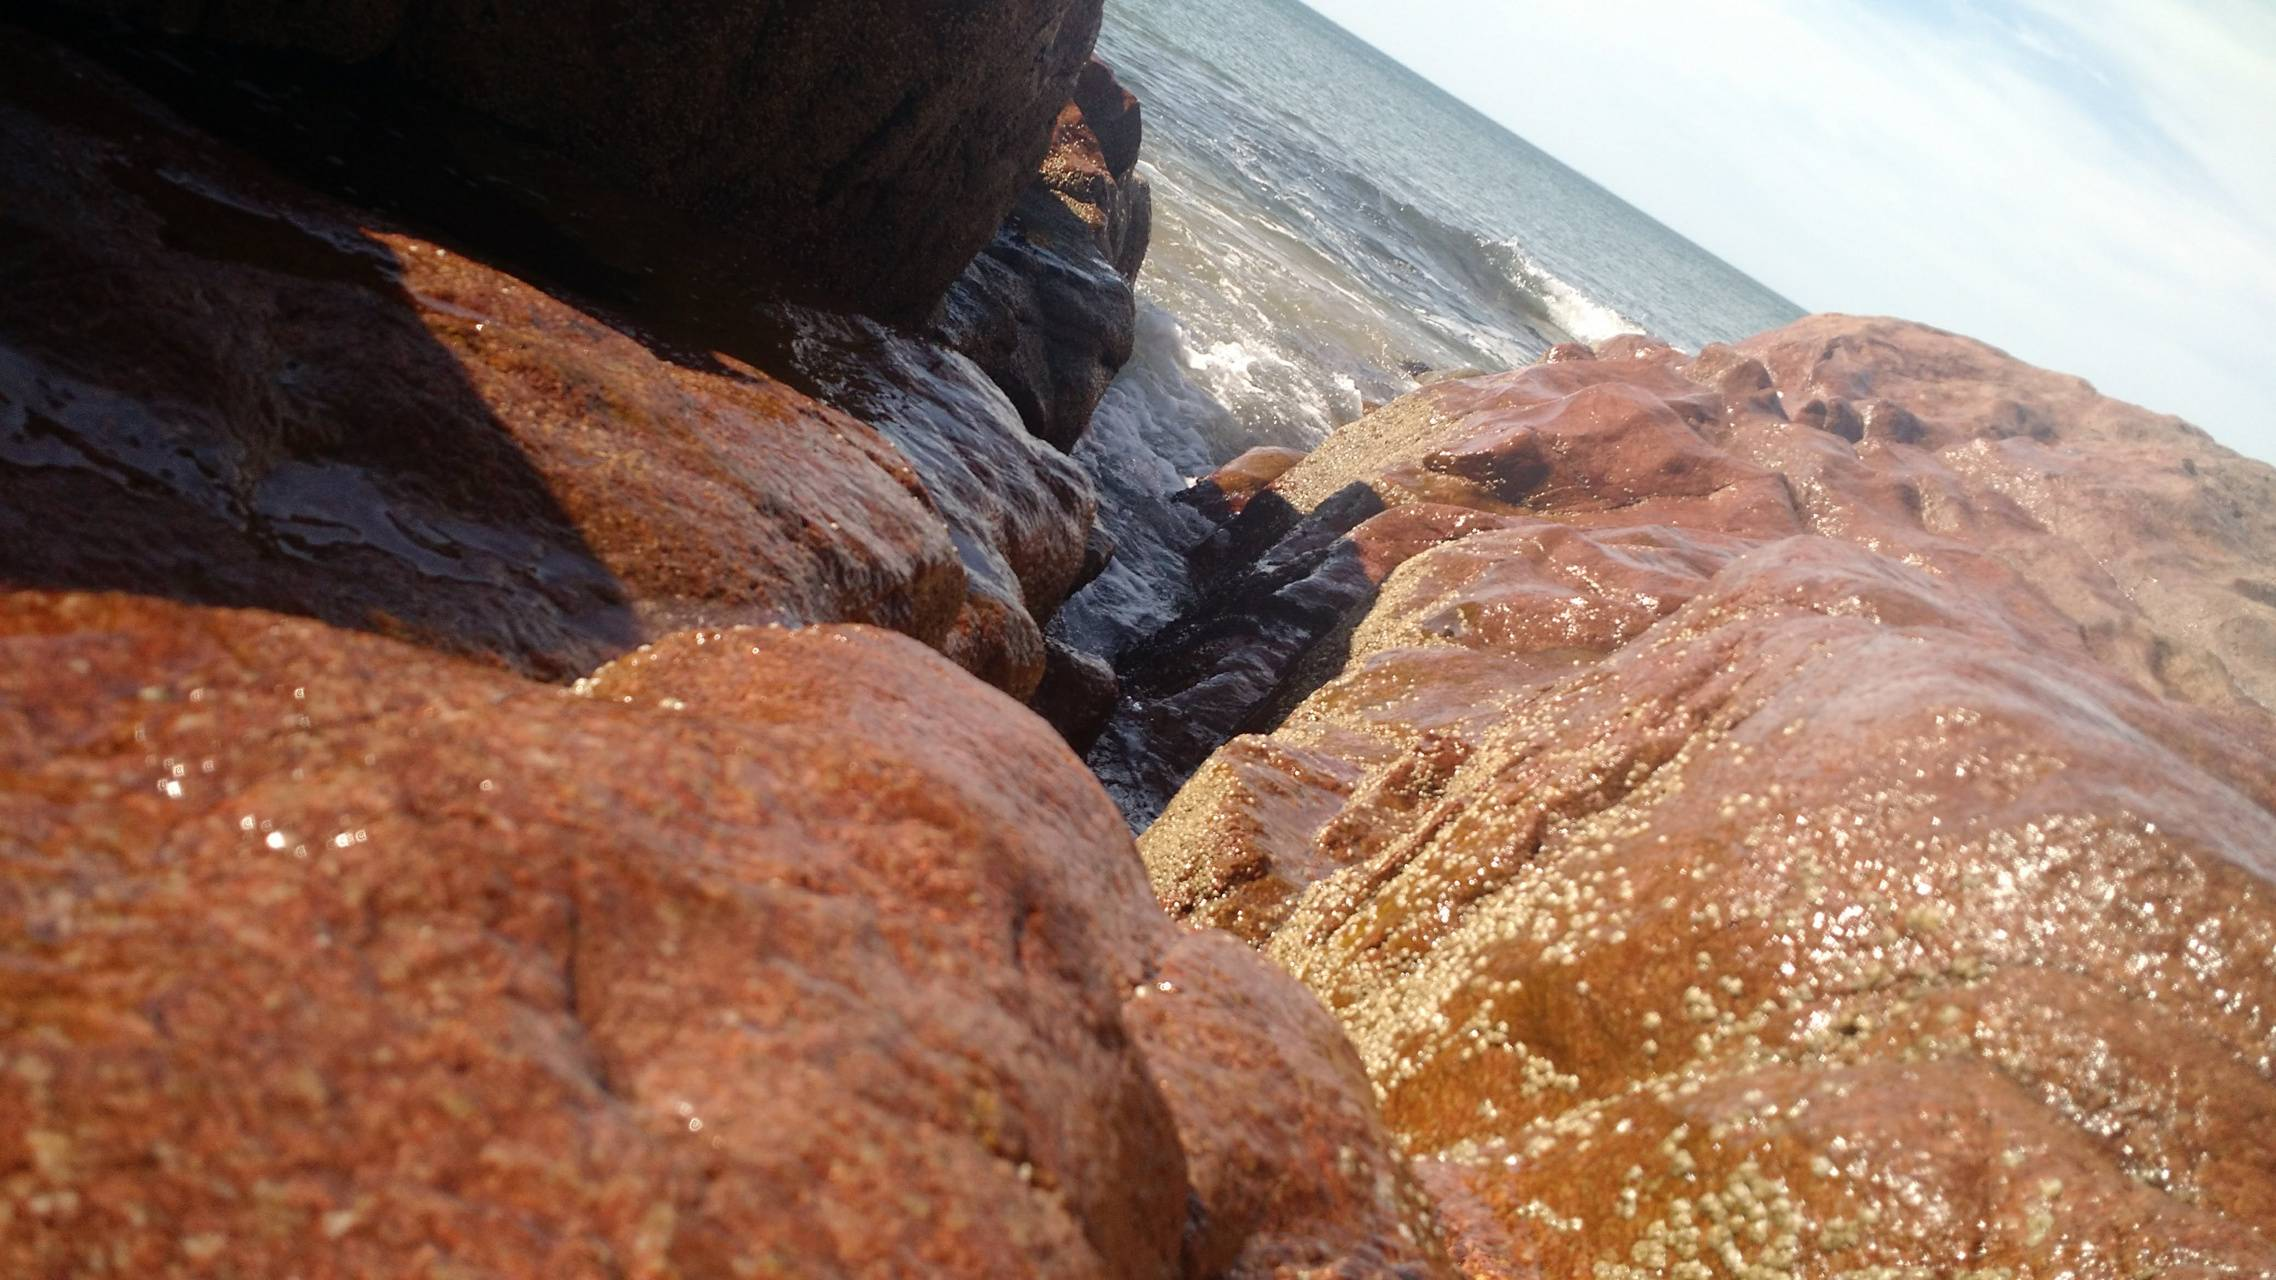 Mar and rocks